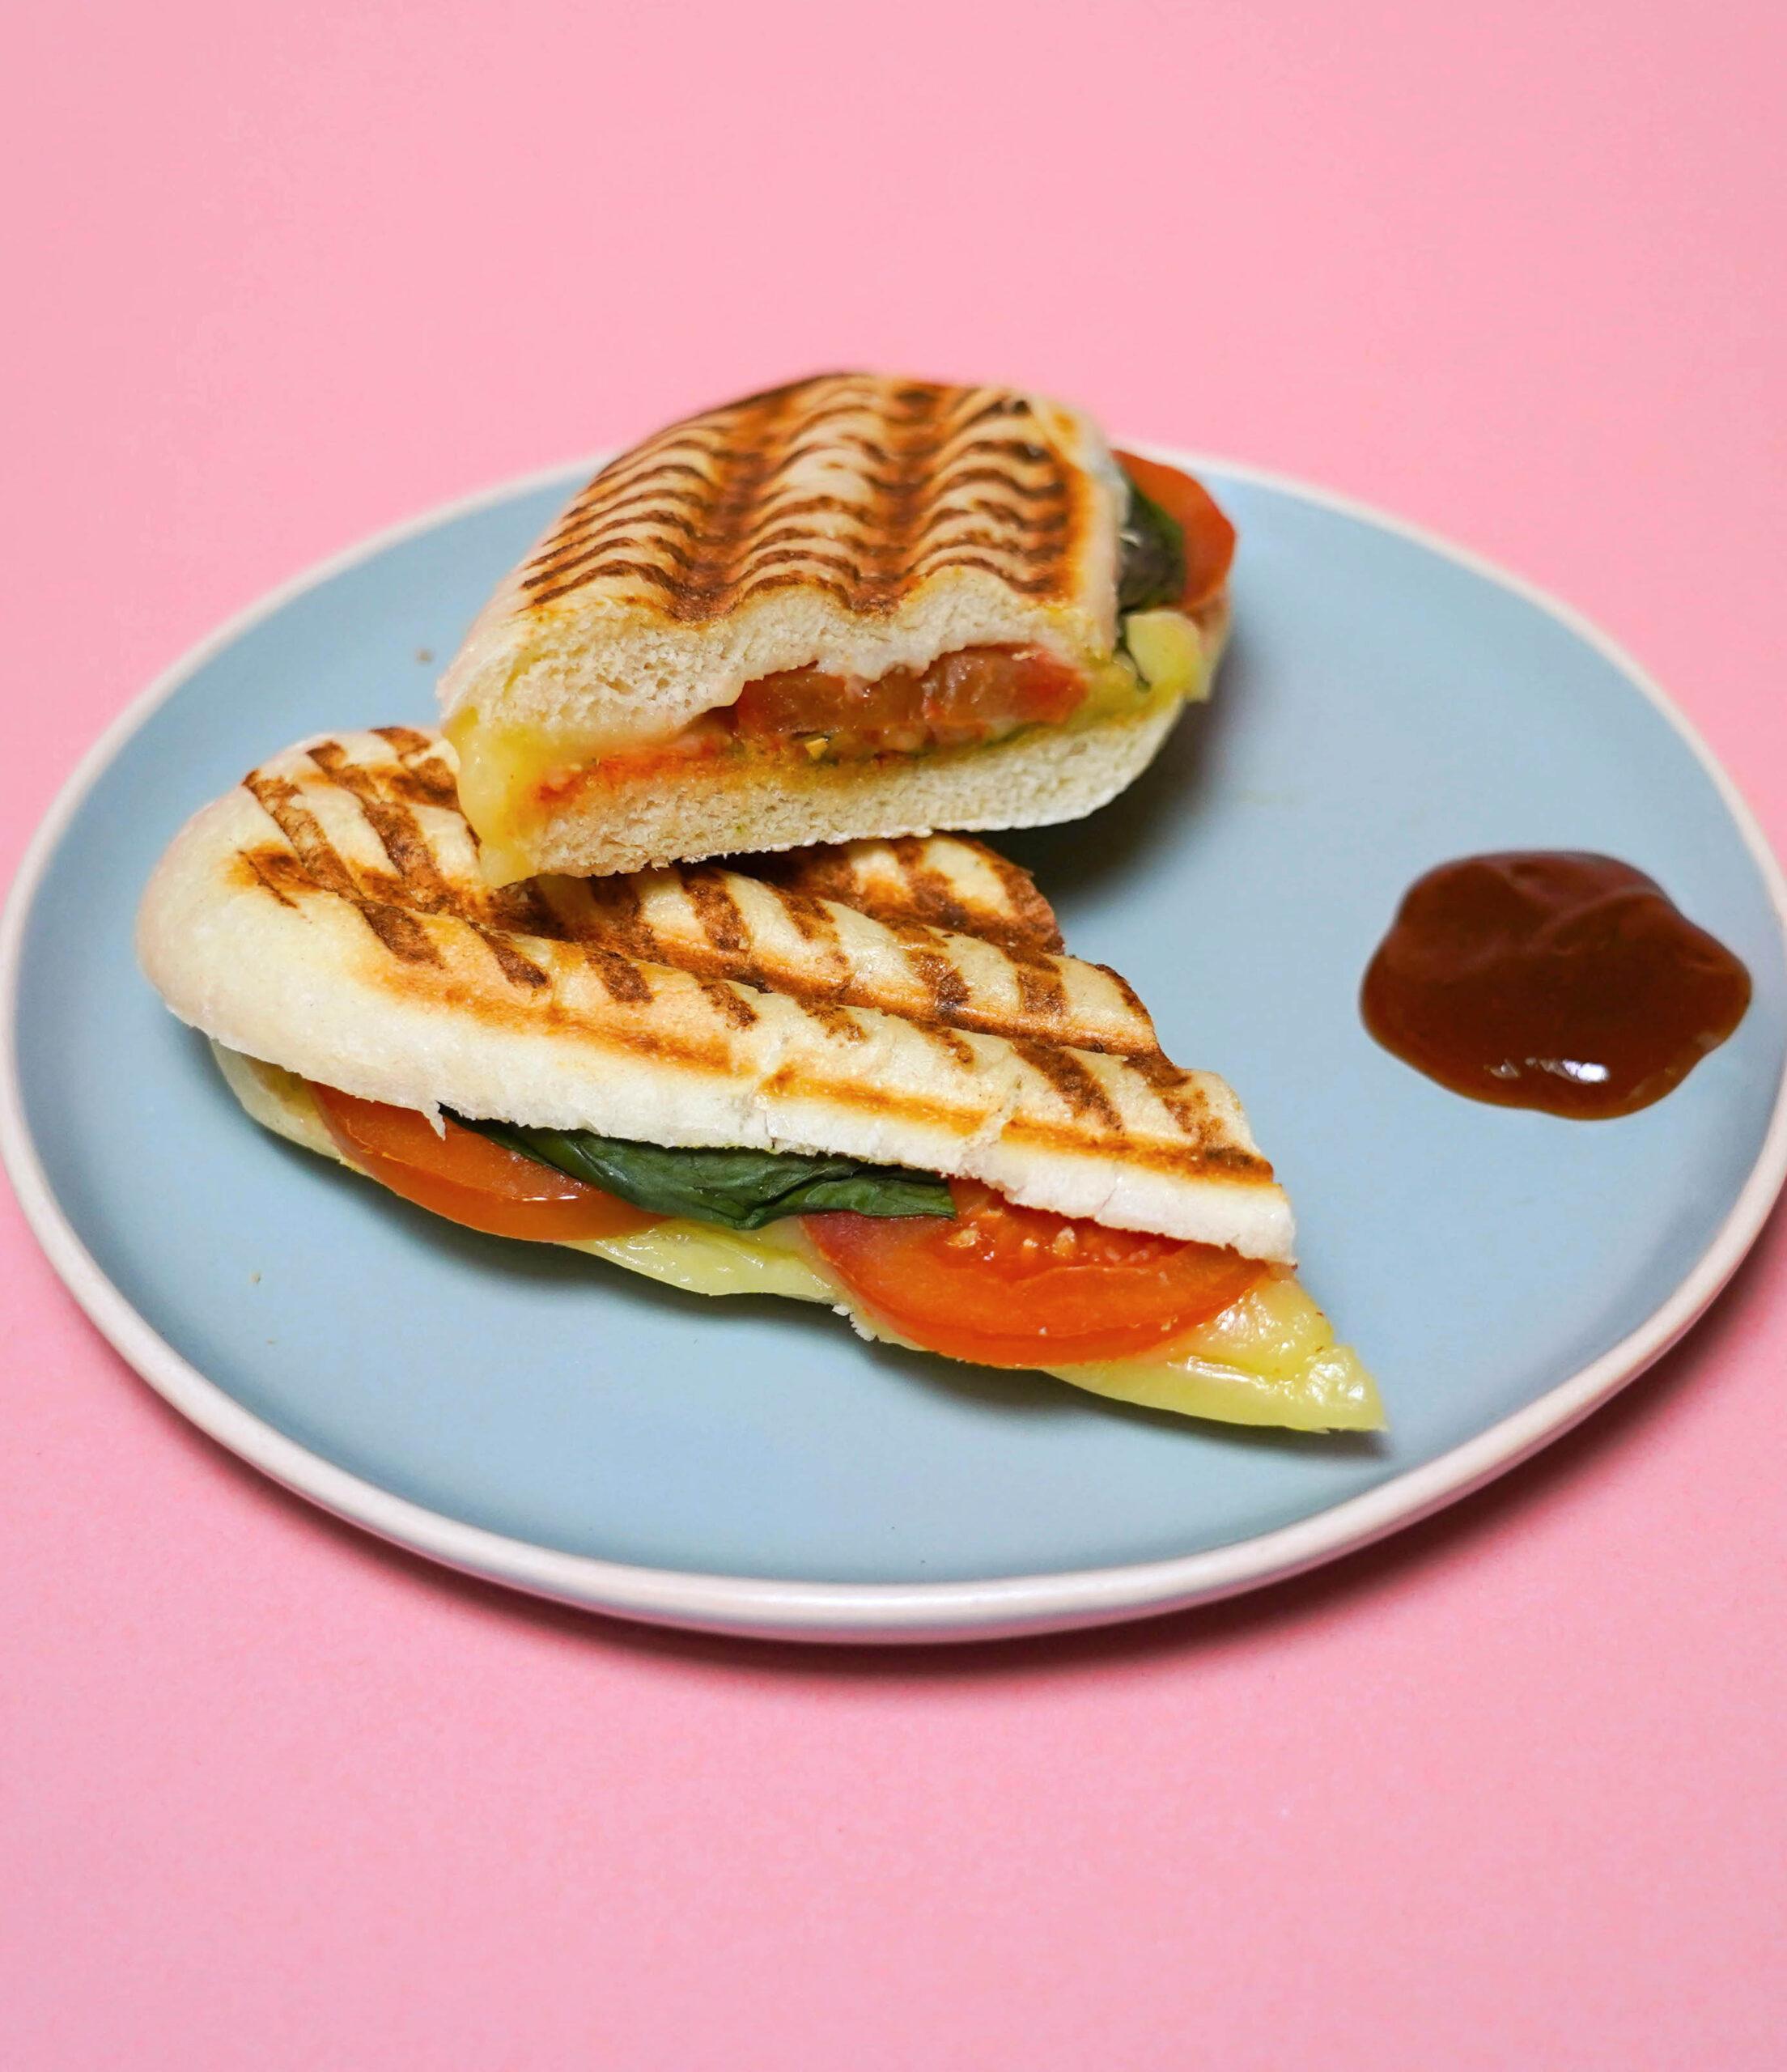 Toasted by BloemCool - panini's